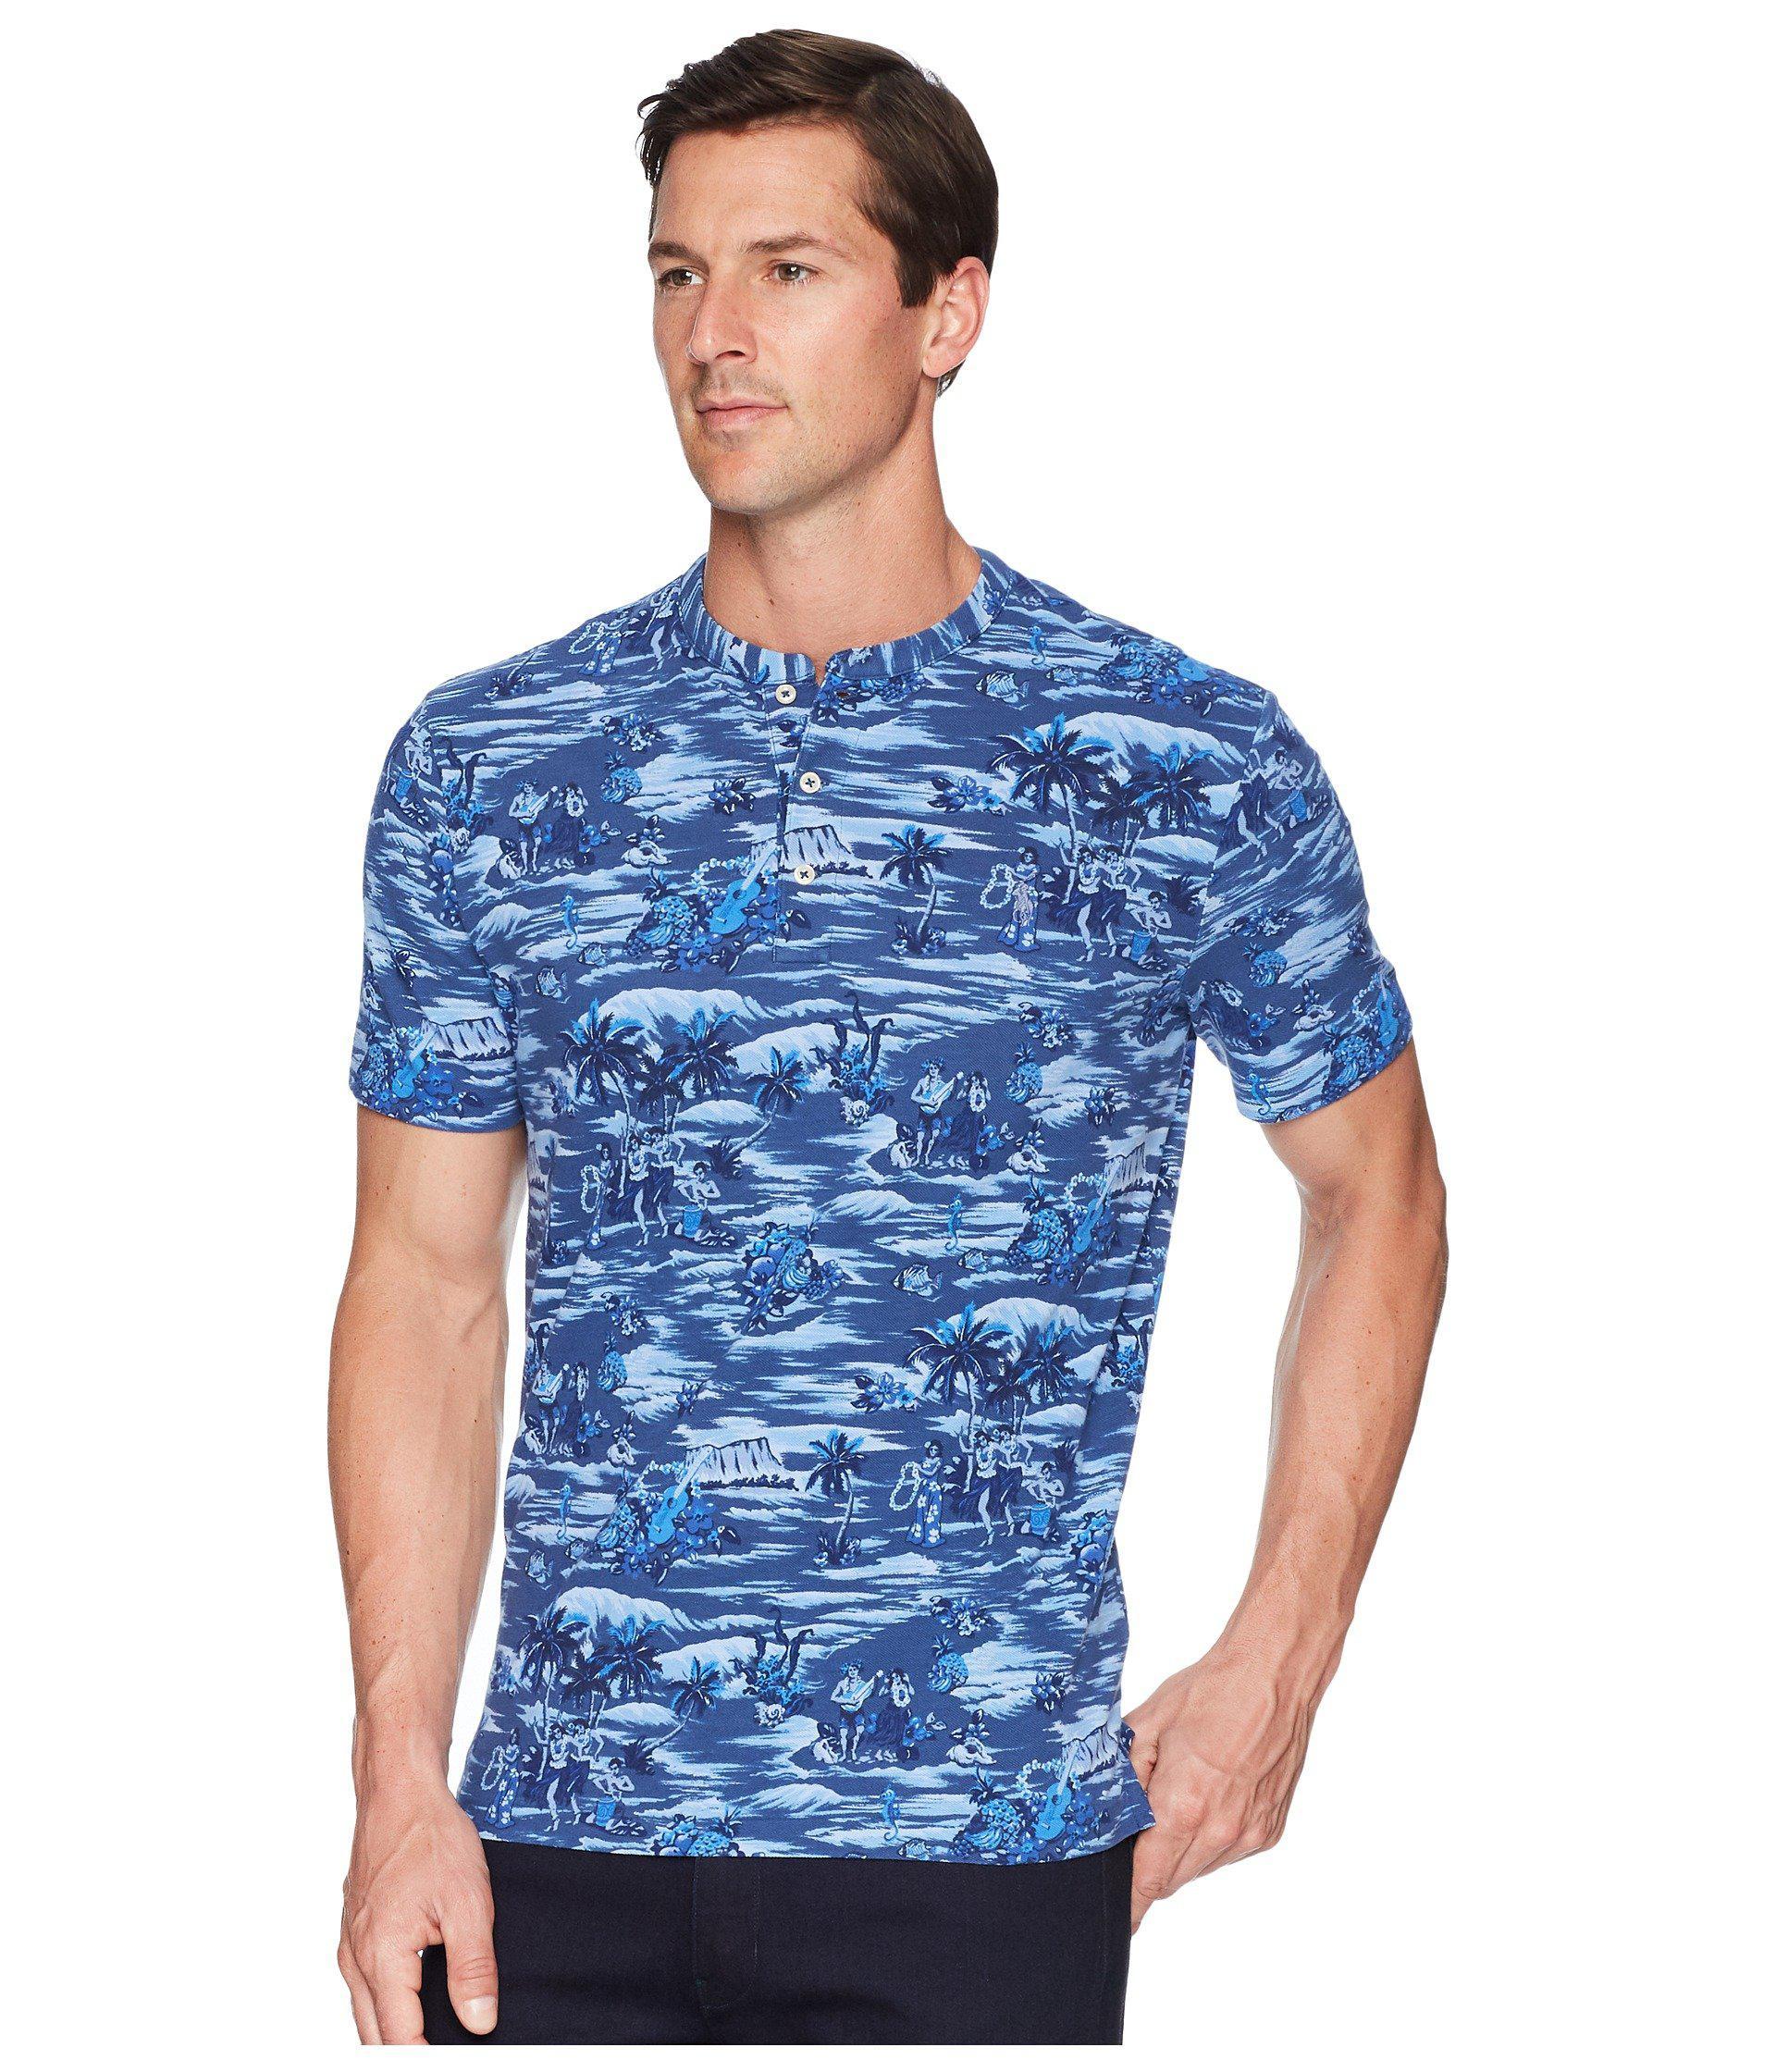 Lyst - Polo Ralph Lauren Featherweight Short Sleeve Knit Henley in Blue for  Men - Save 51.02040816326531% a0d32a24563d